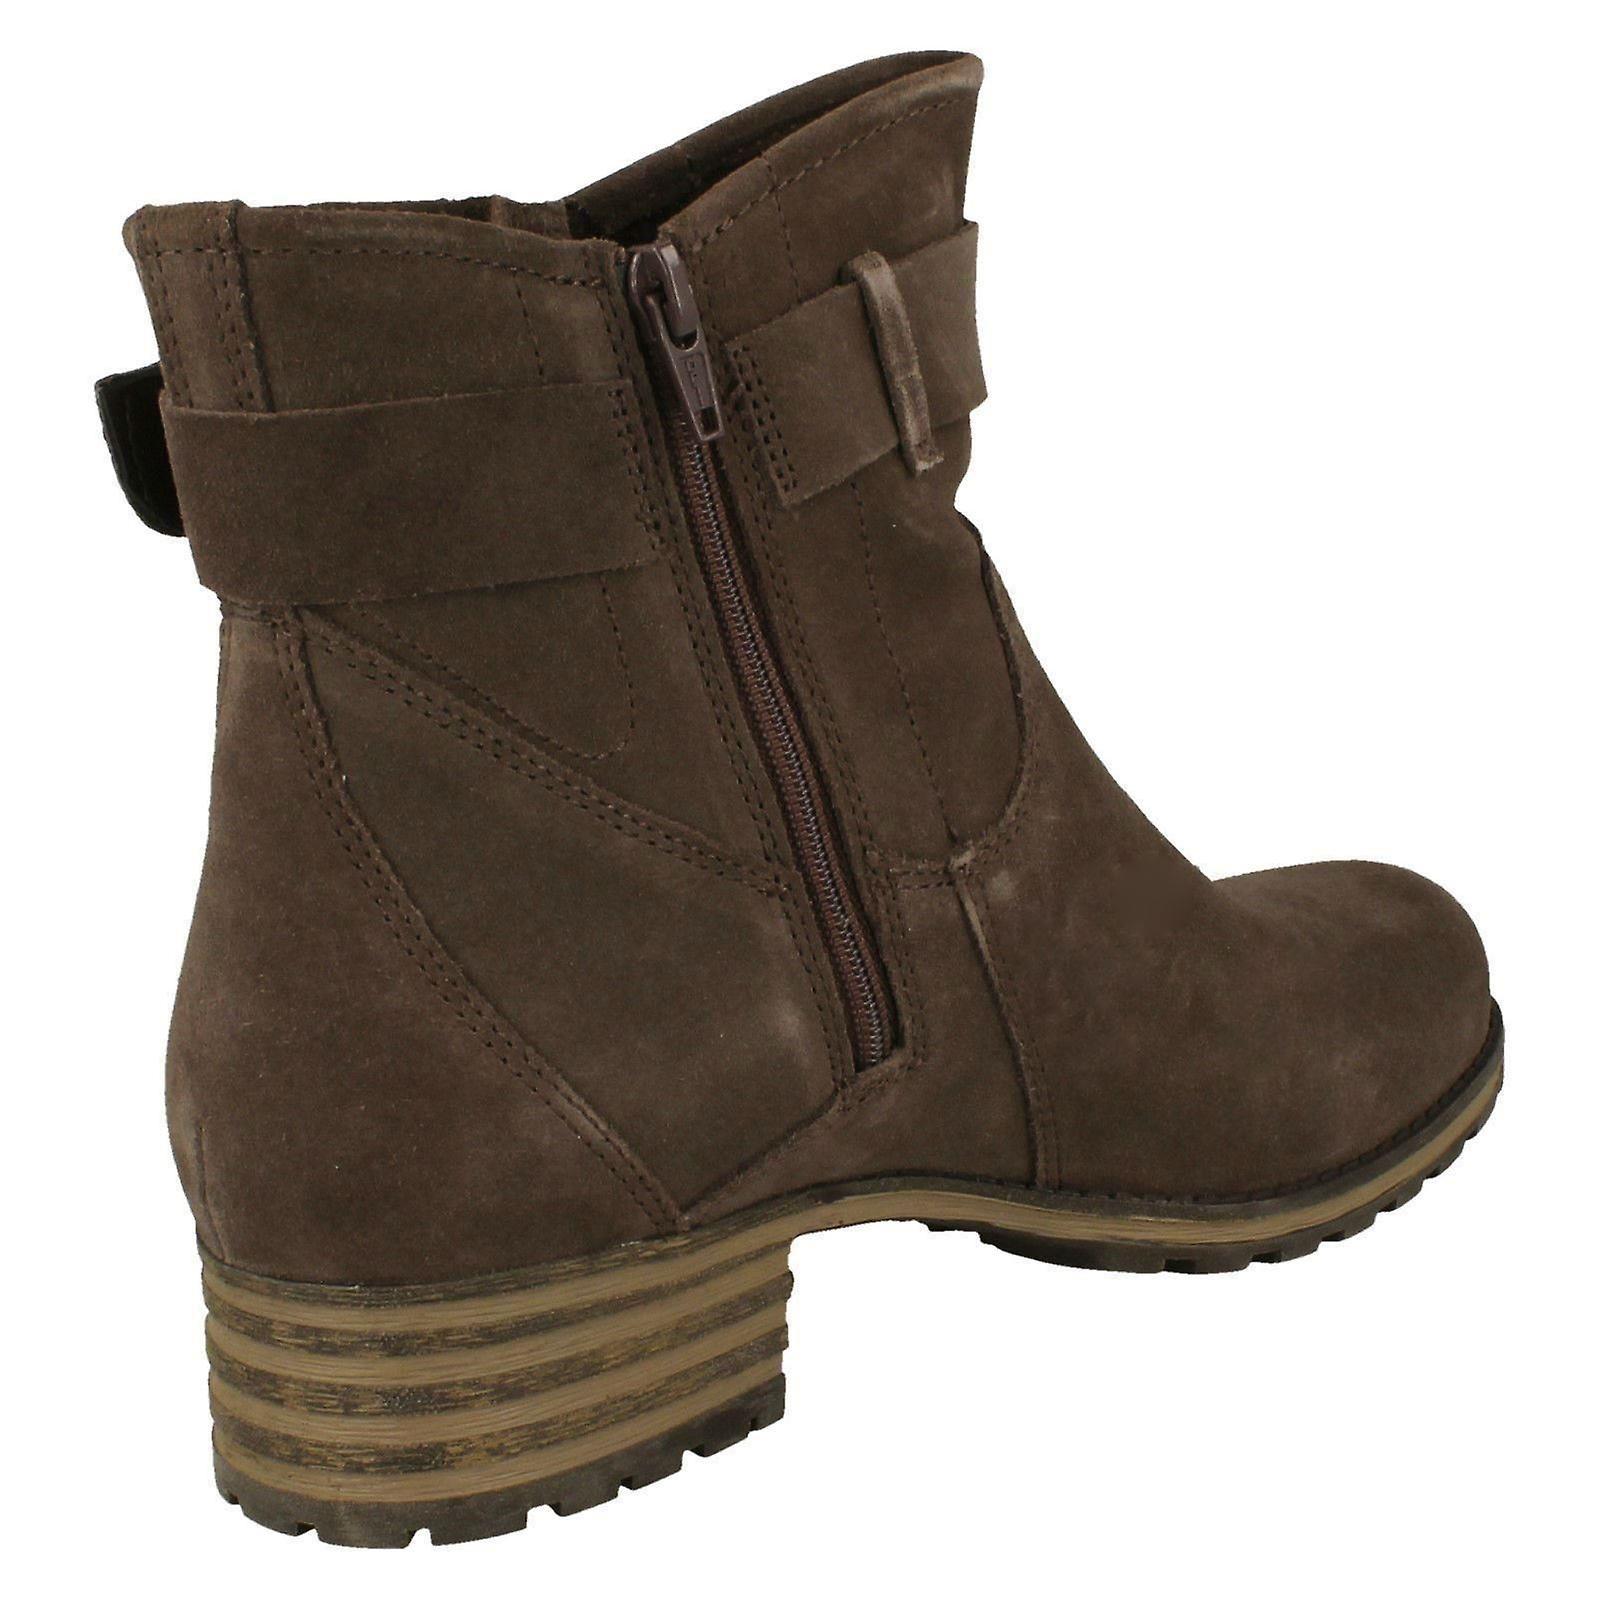 Ladies Clarks Smart Ankle Boots Marana Amber